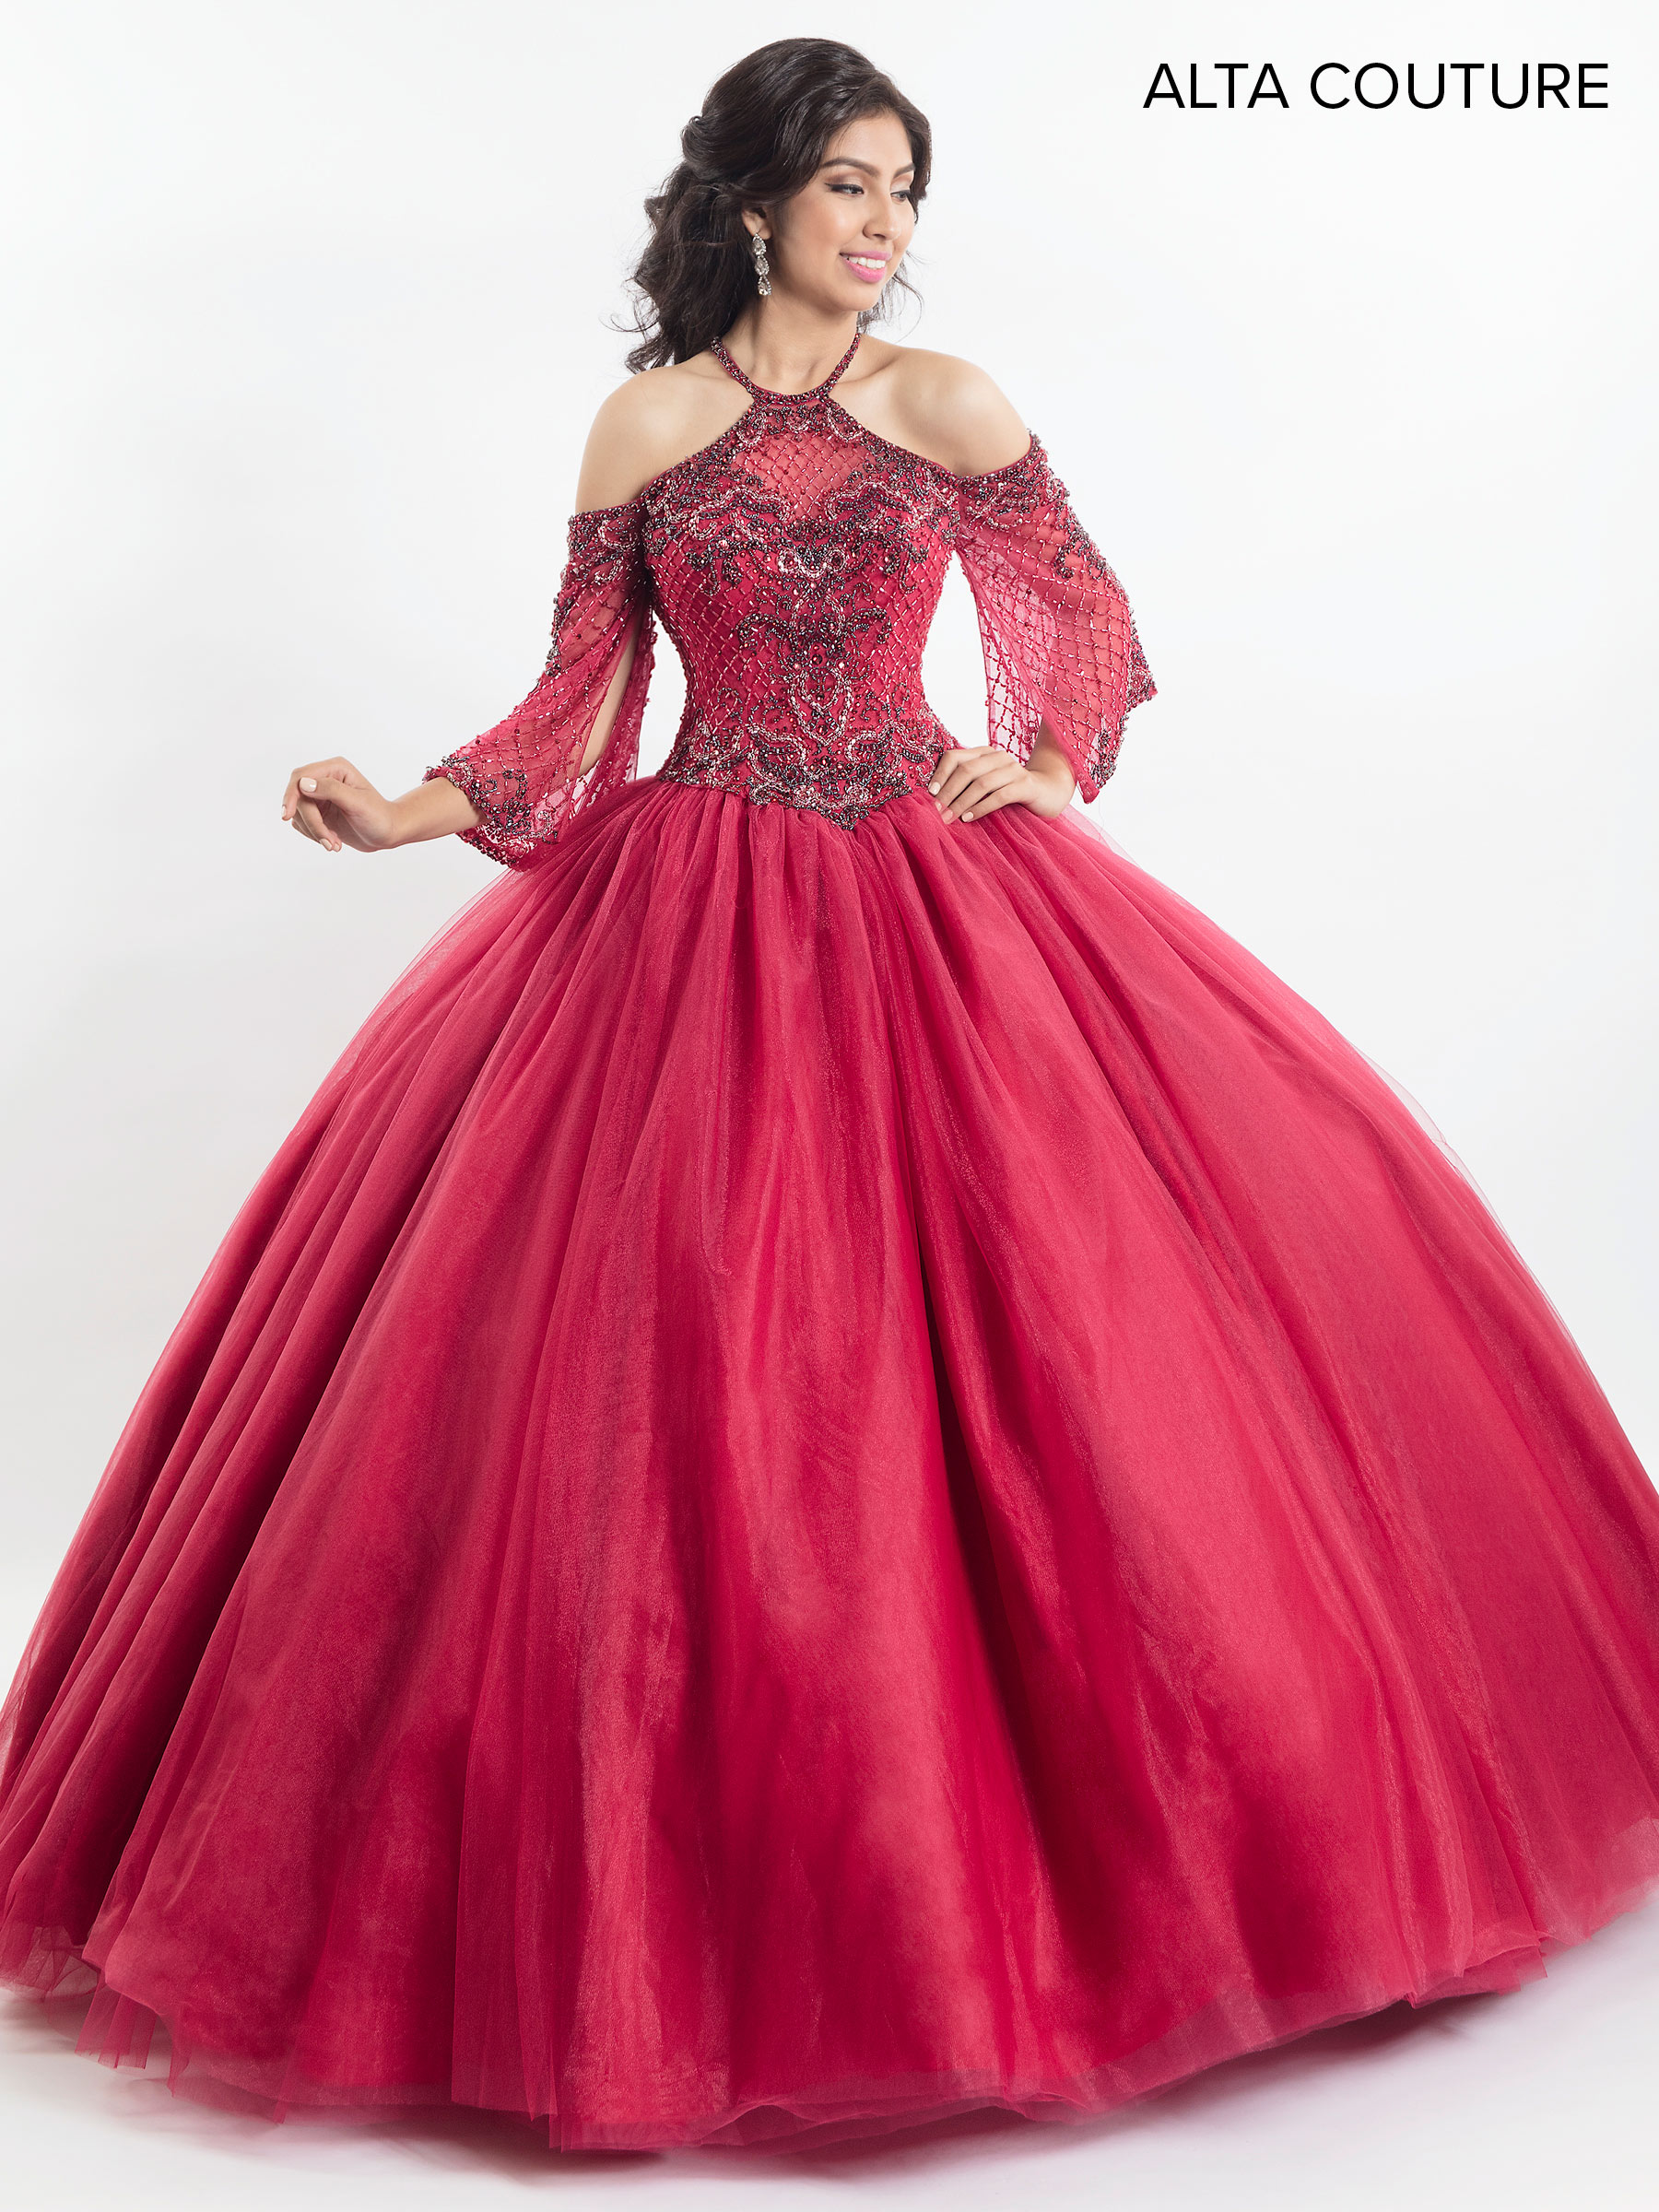 Quinceanera Couture Dresses Alta Style Mq3011